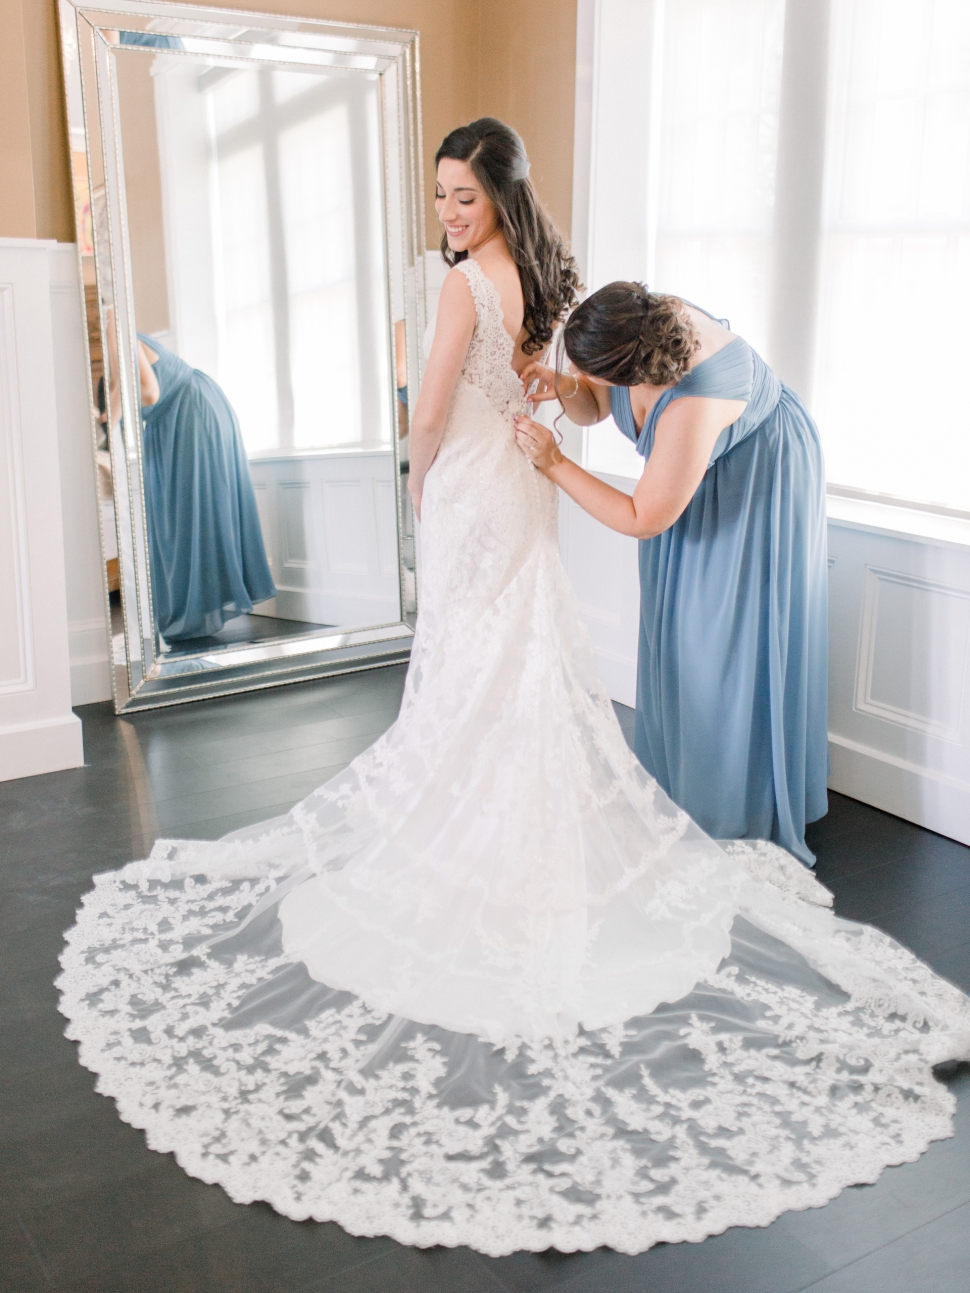 Ryland-Inn-Wedding-Photographer-Cassi-Claire_Ryland-Inn-Wedding_08.jpg